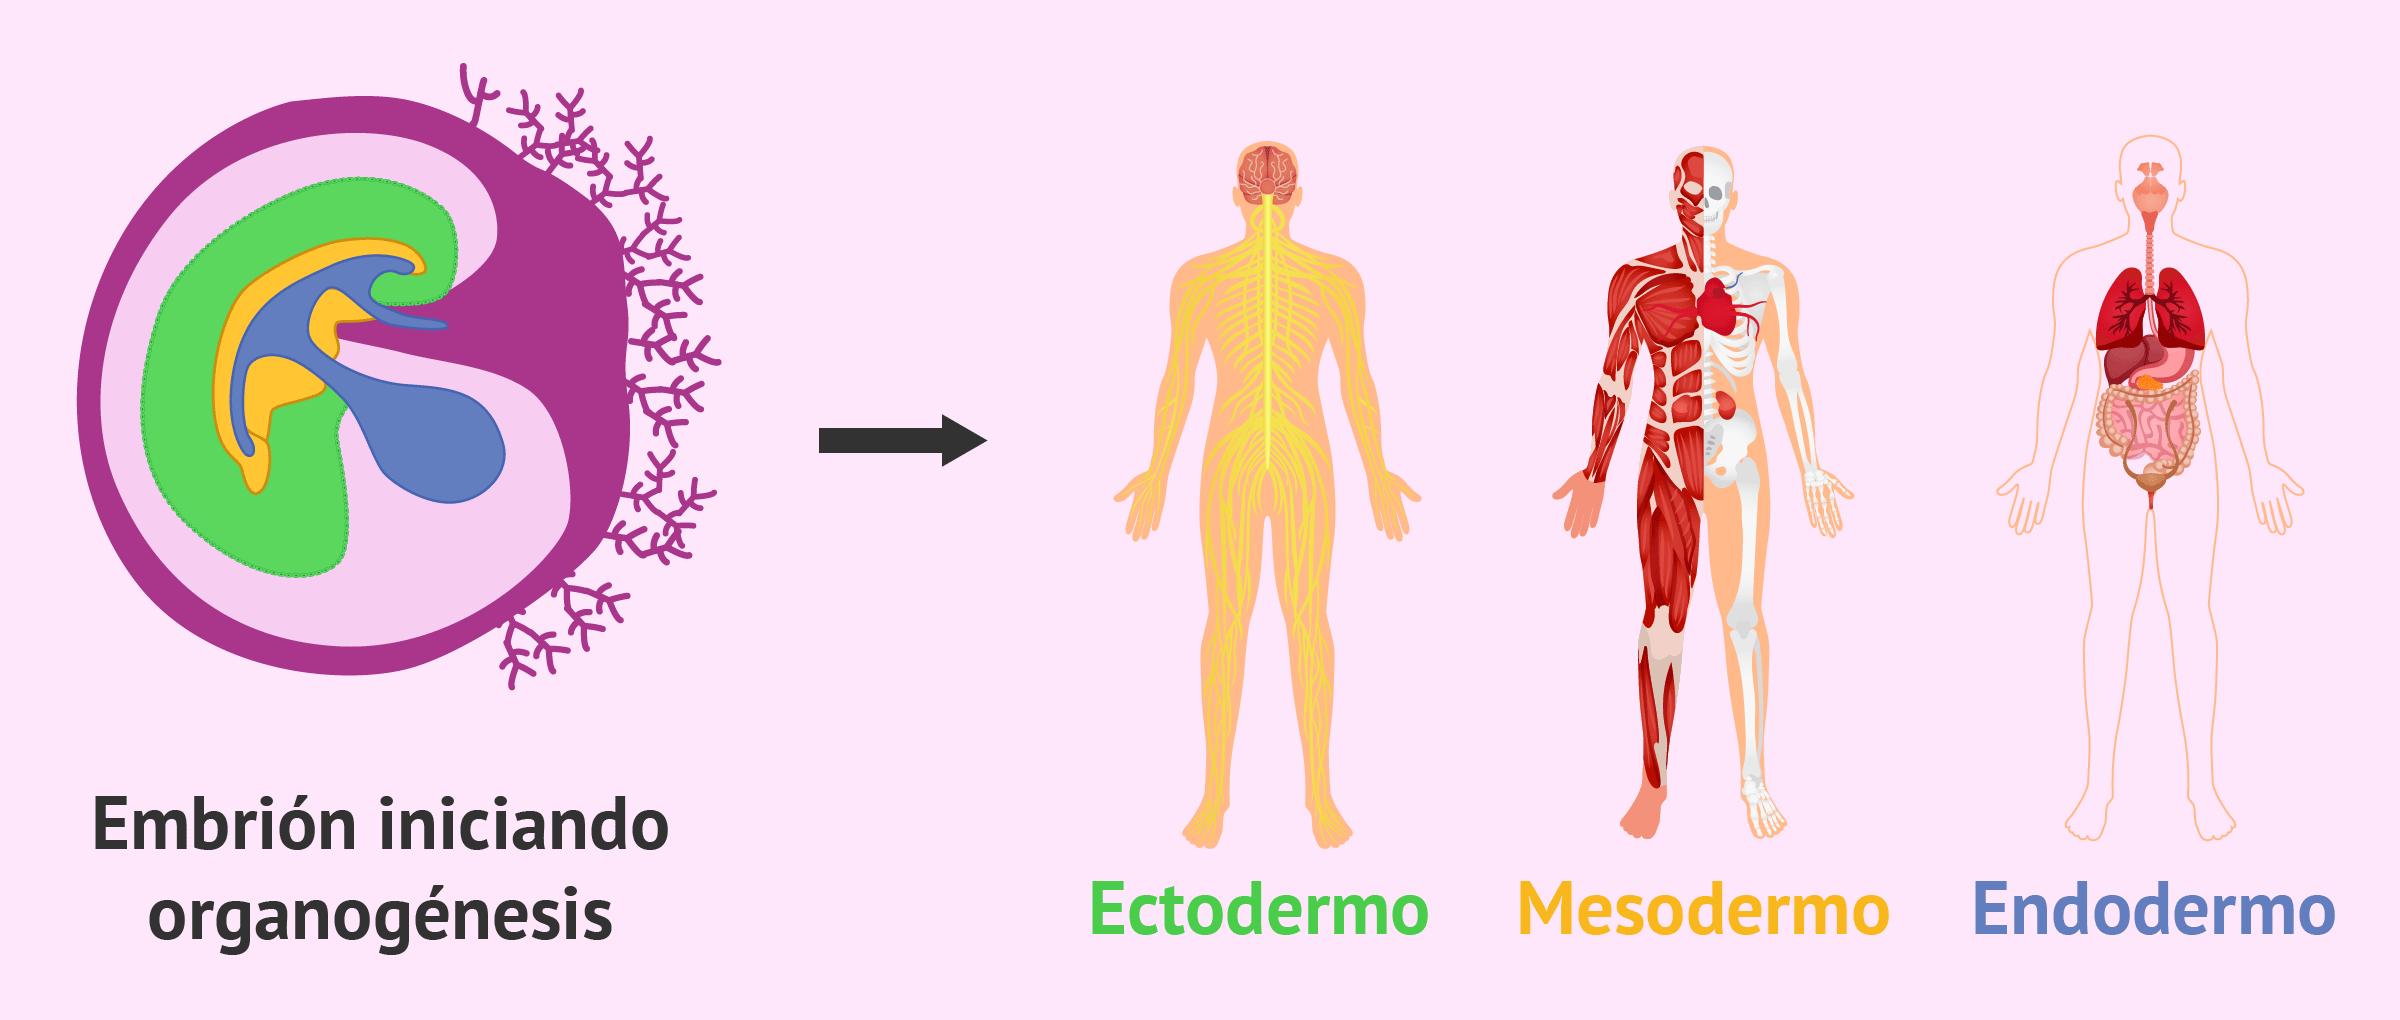 Capas embrionarias y organogénesis